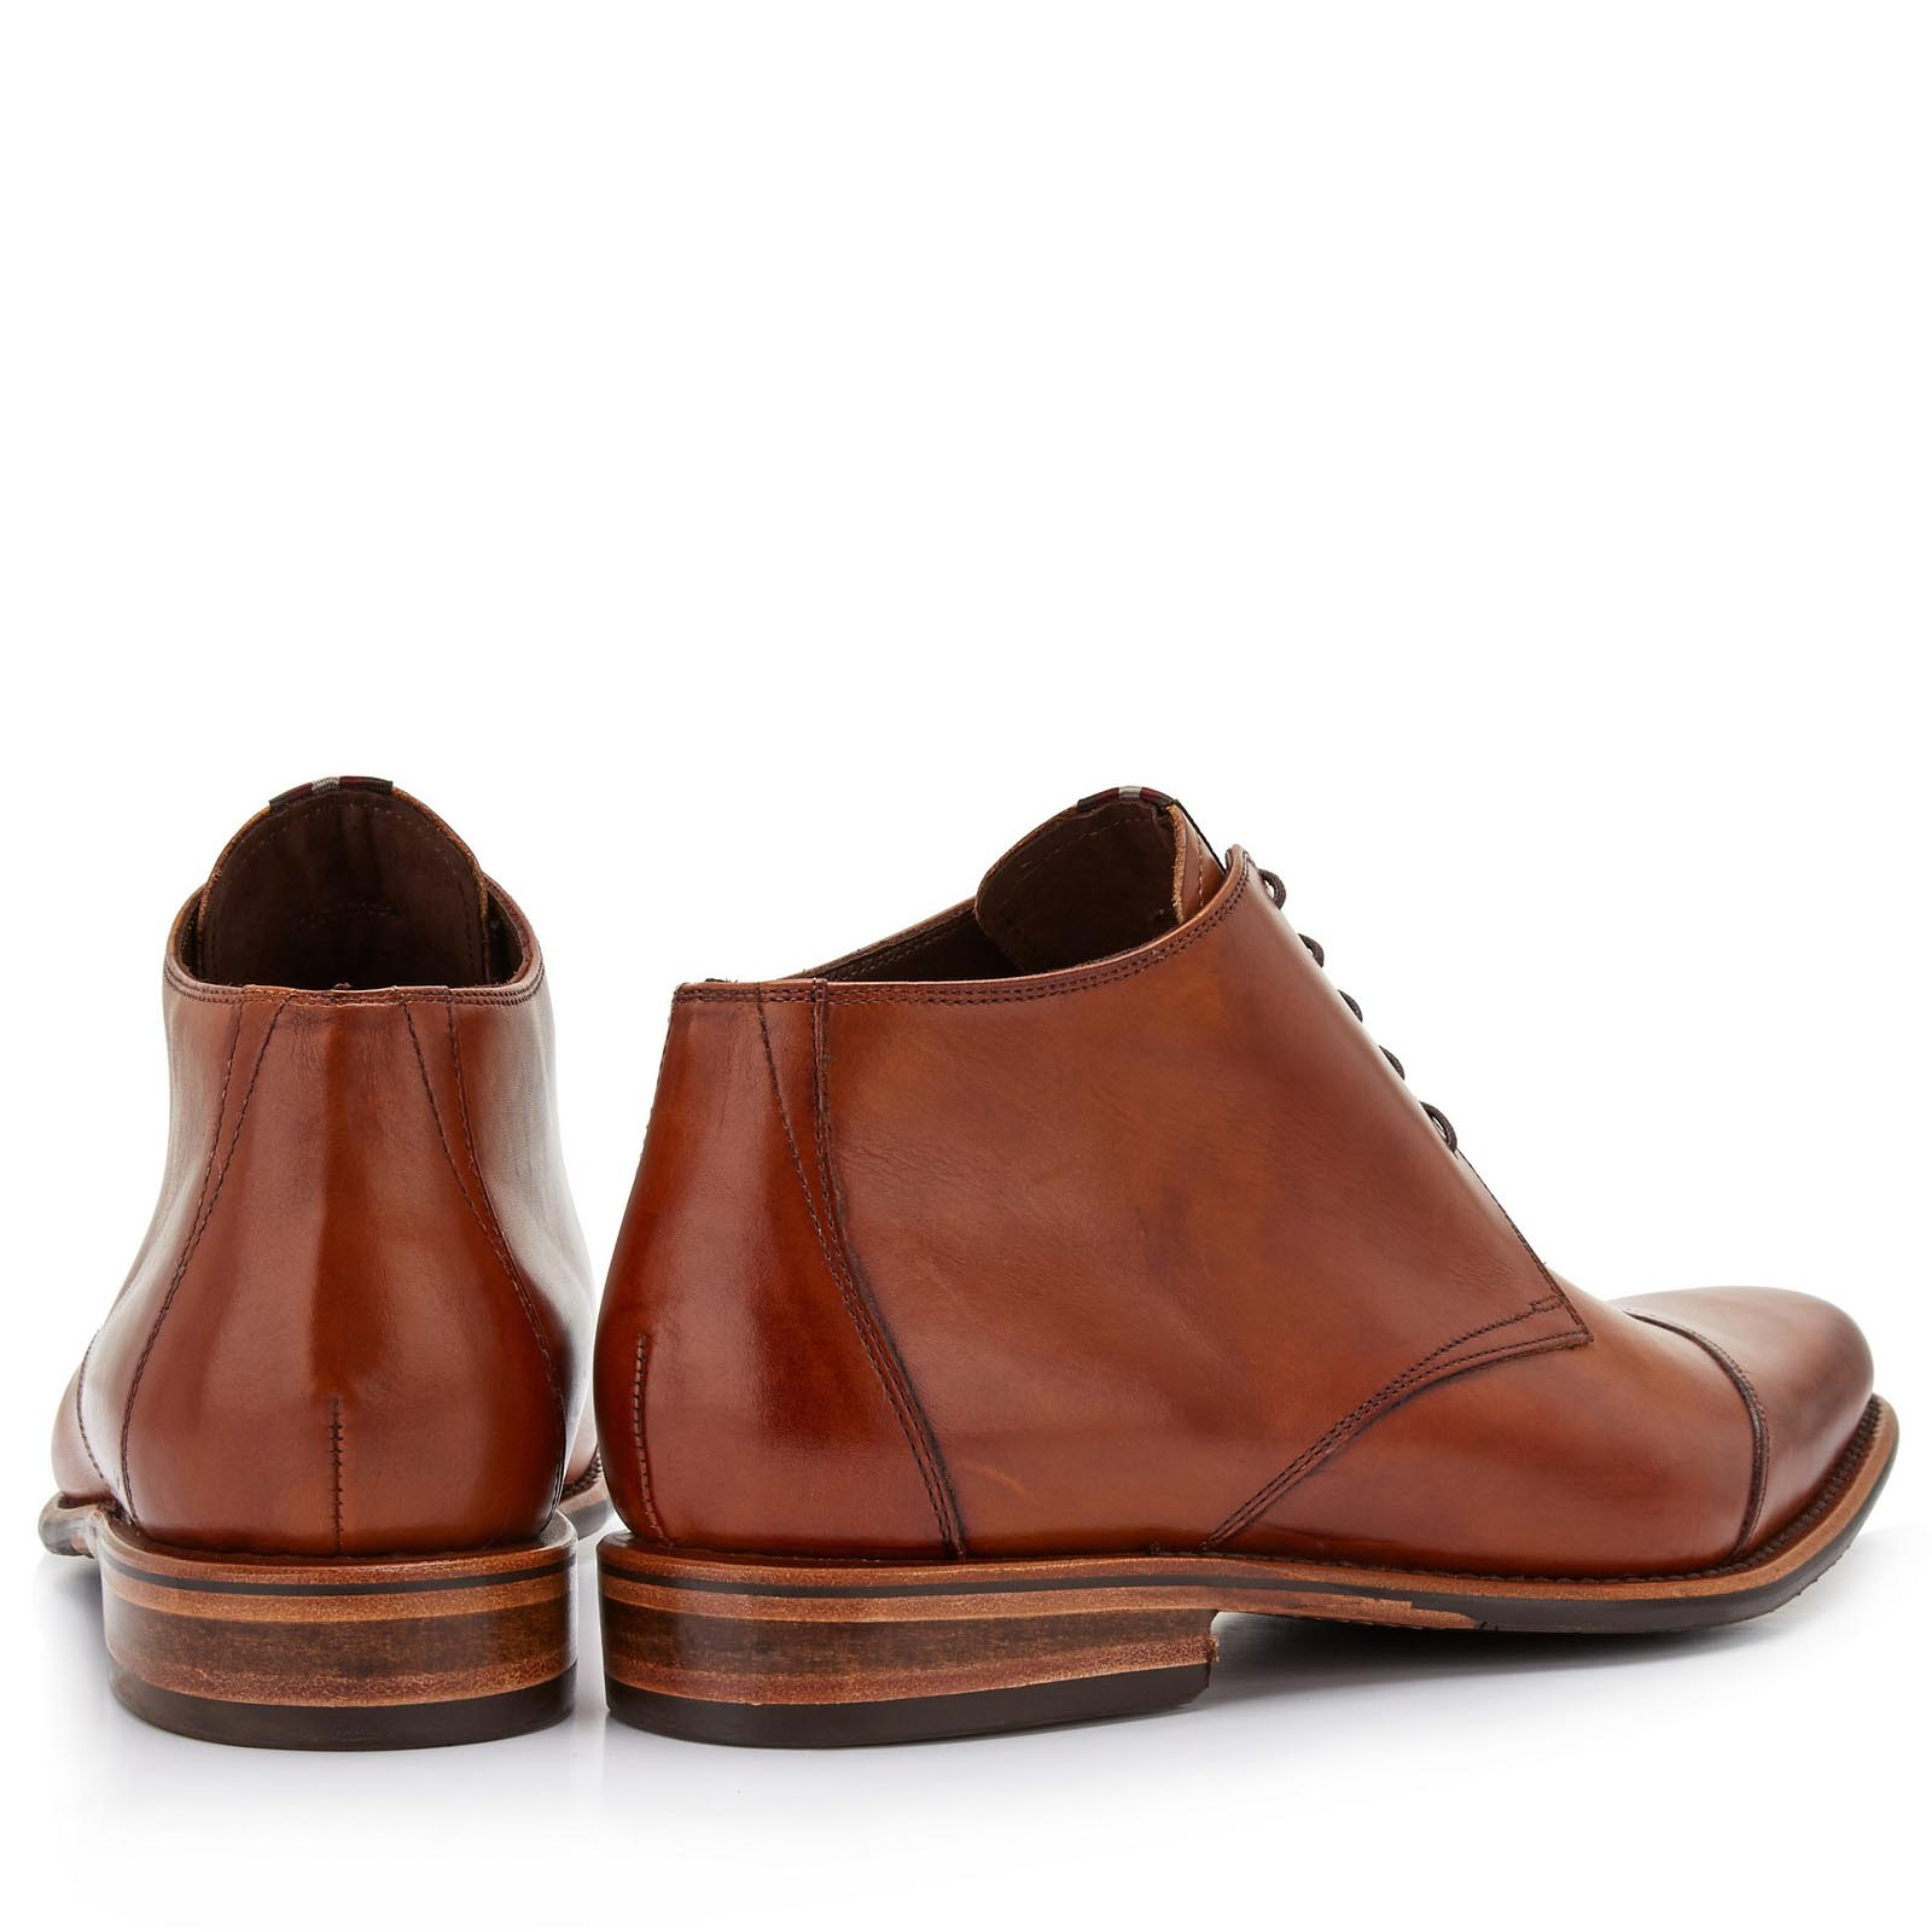 e151ac95934f61 Floris van Bommel Floris Dressed Cognac Calf 10077/11 online ...